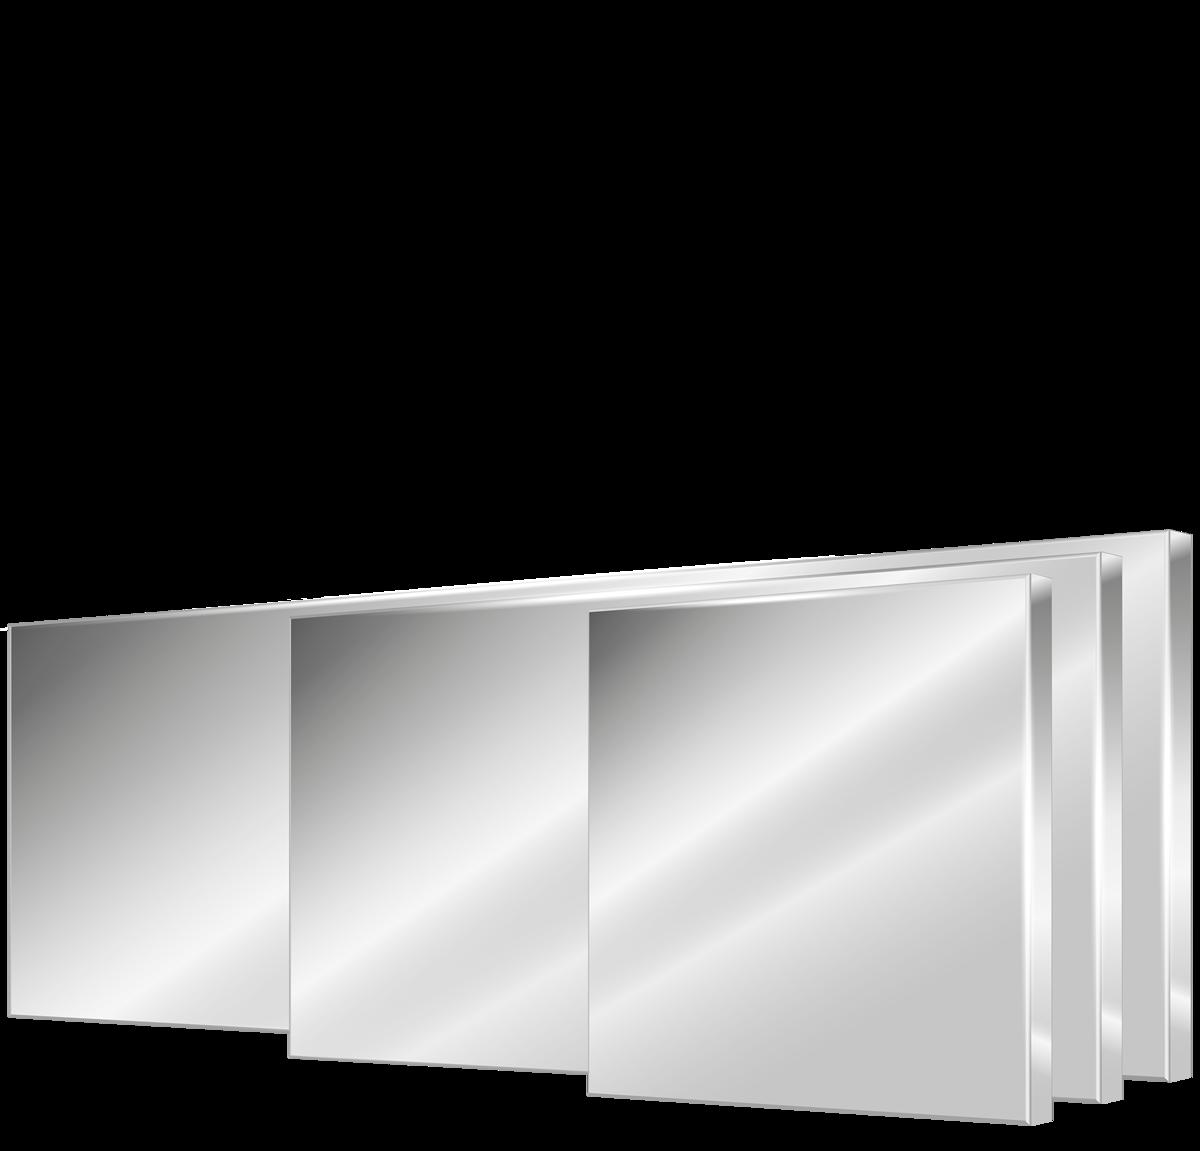 RVS<br>spiegels<br>S50, S100 en S150